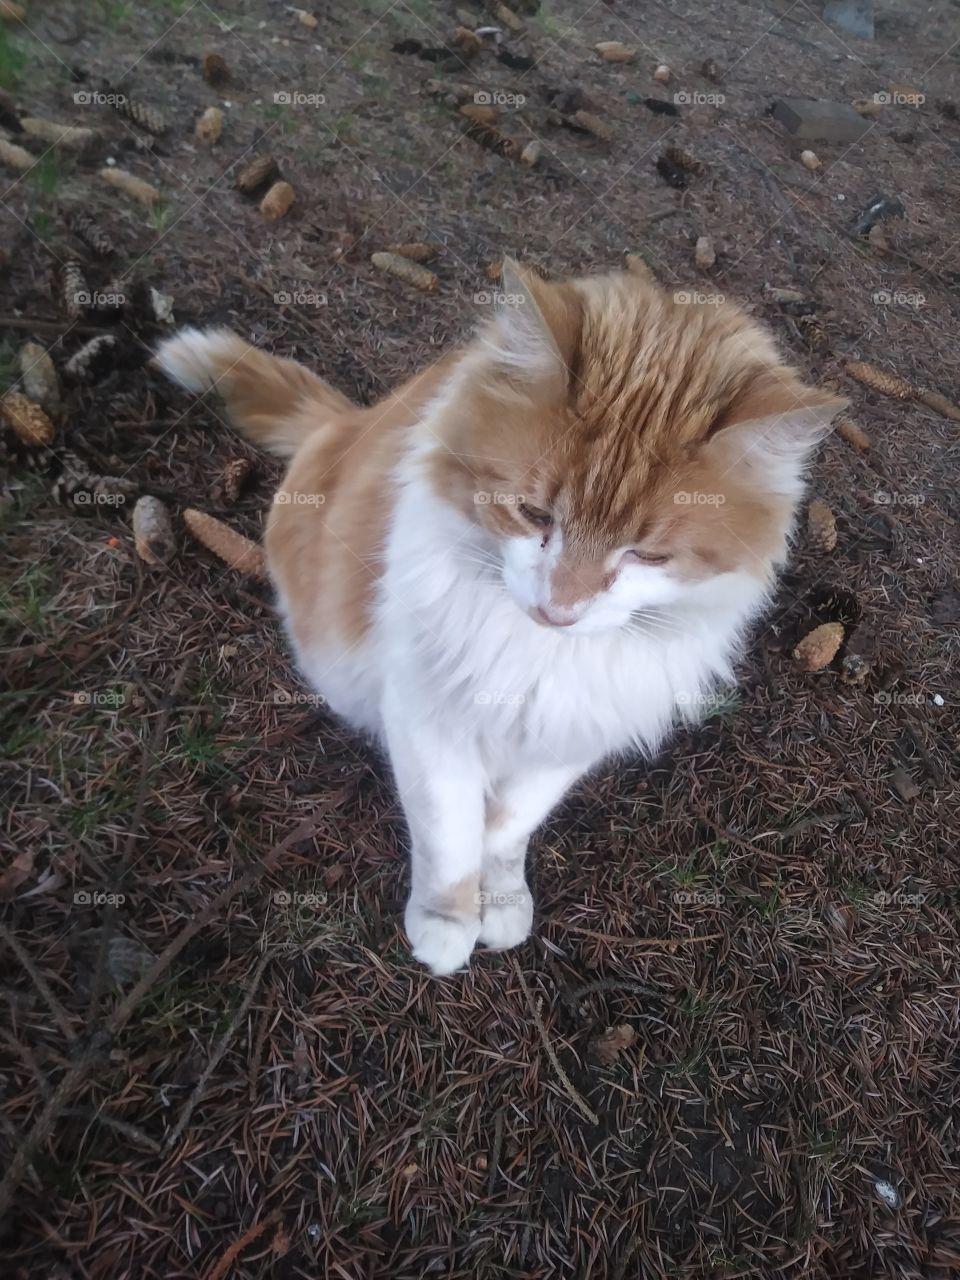 An orange and white cat named Natsu enjoying the day 😻